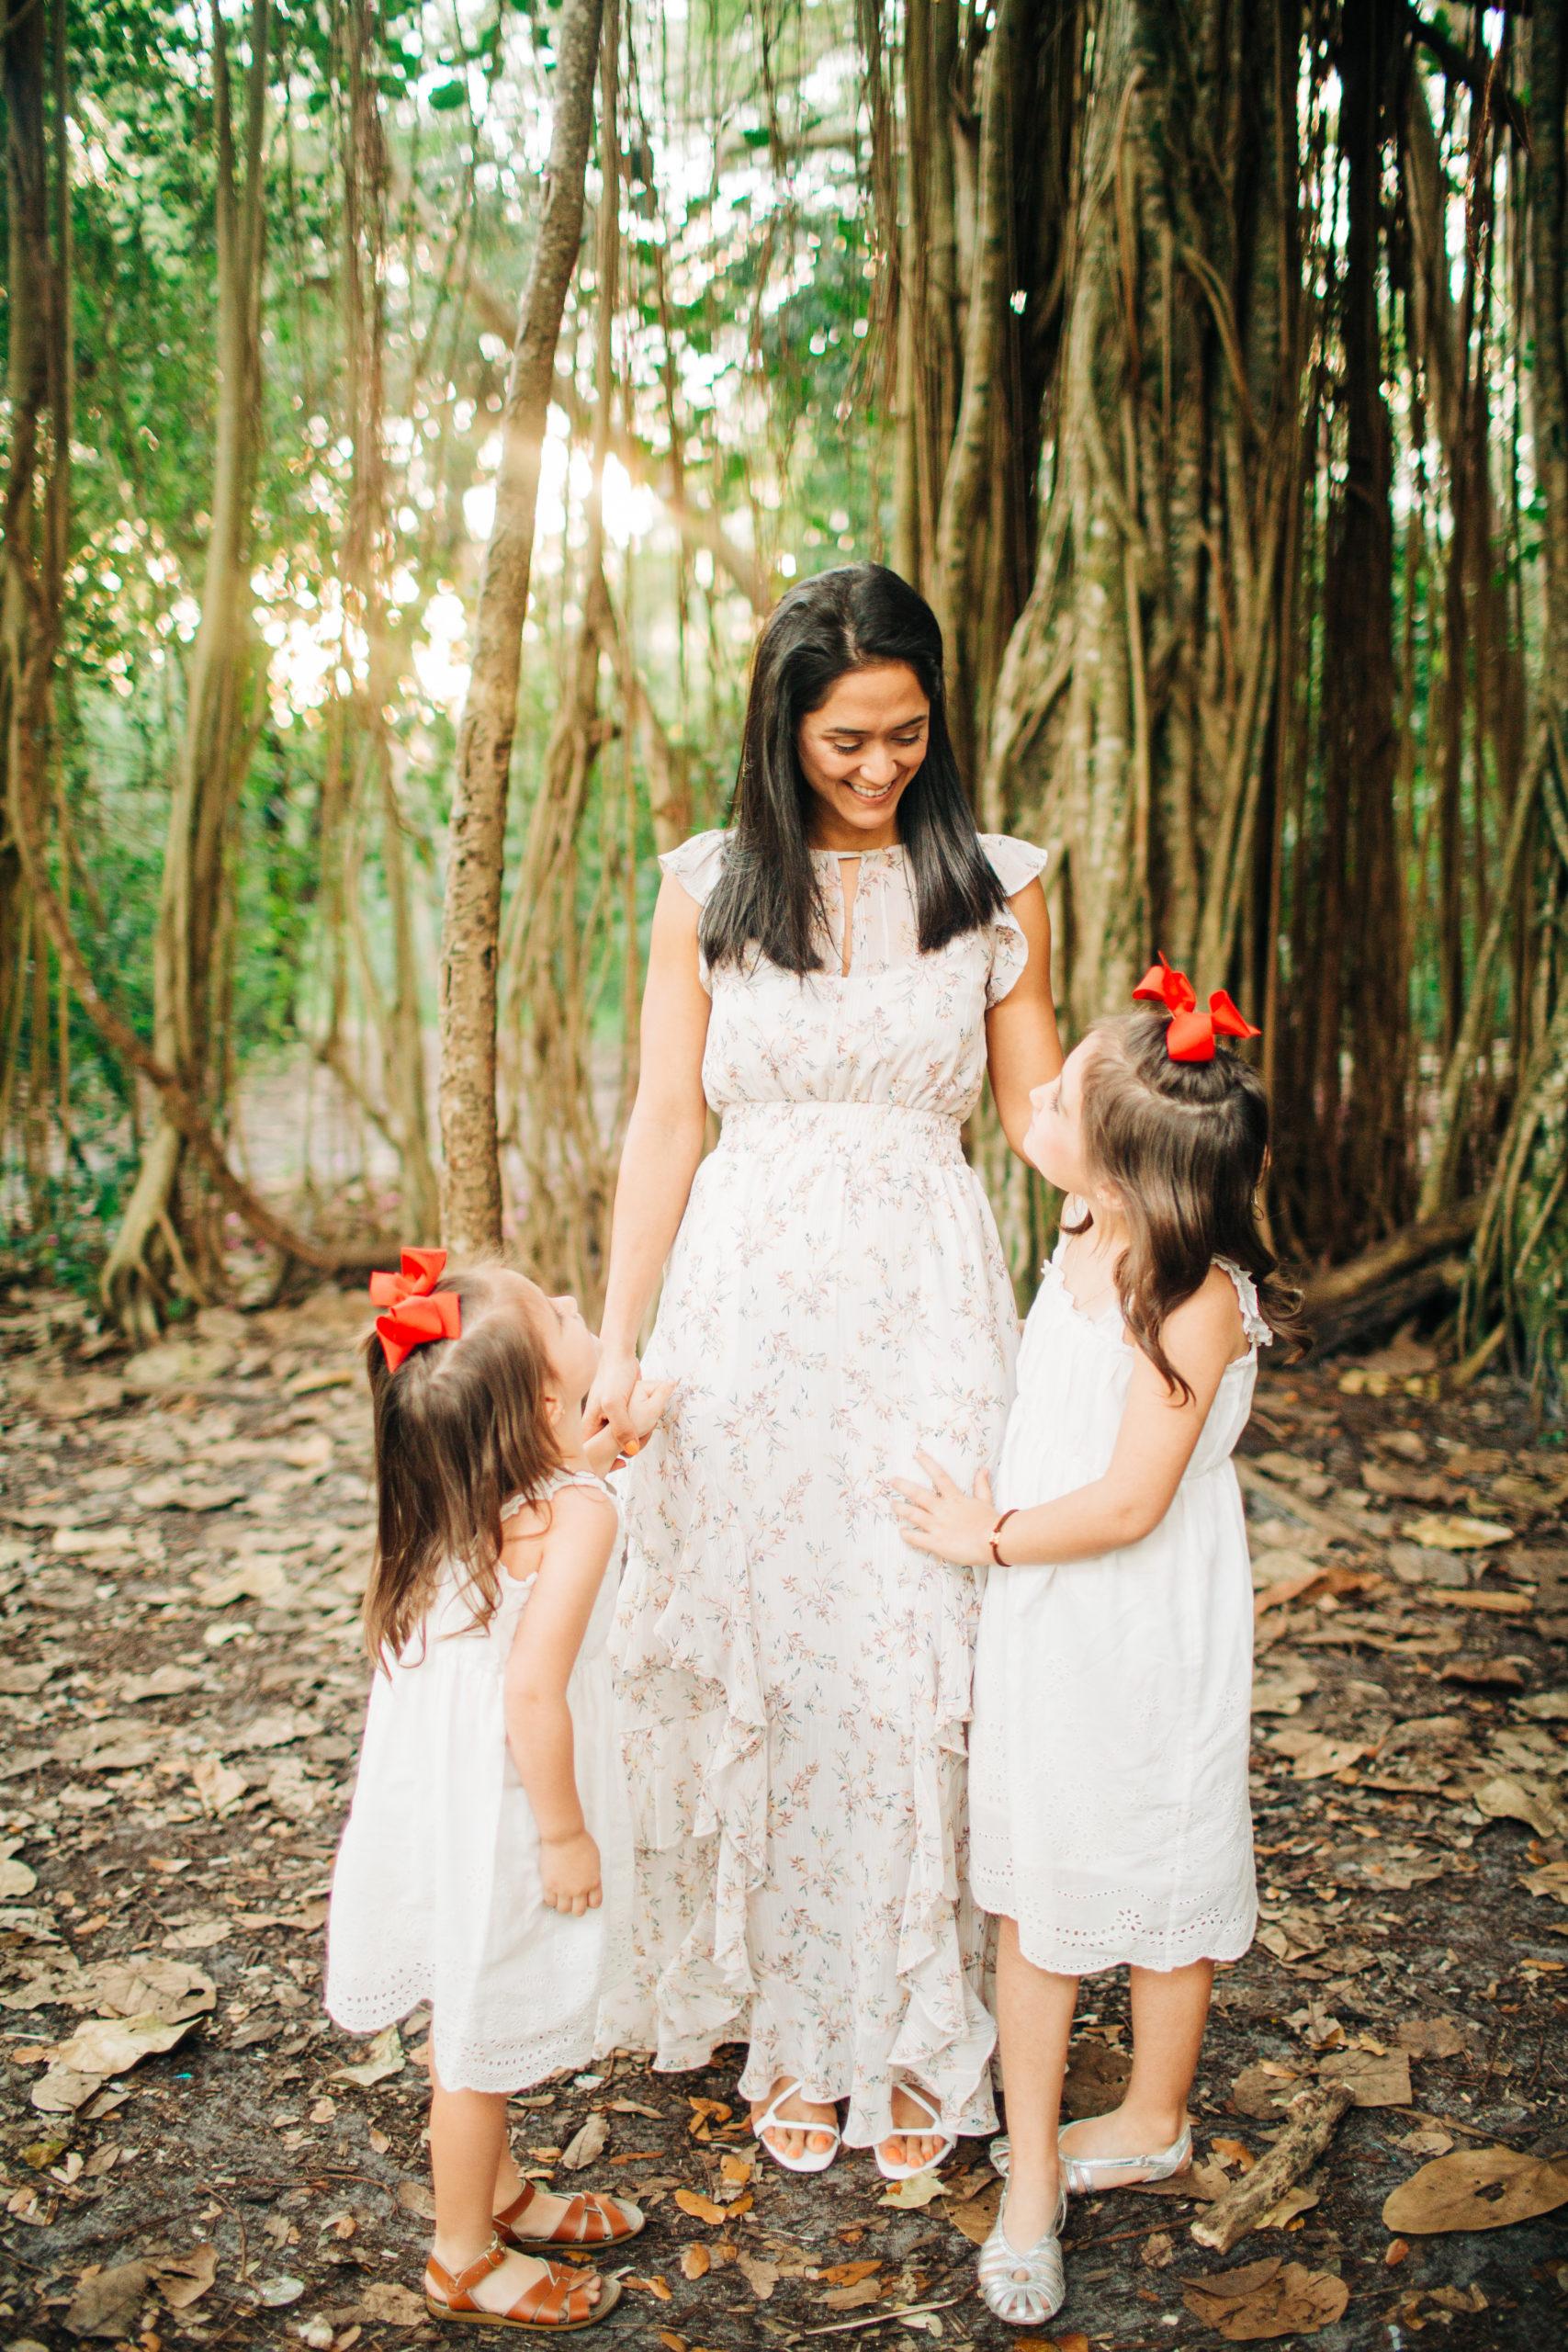 MotherhoodSessionPark_Miami-13-1-scaled Miami's 8 best Photoshoot Locations